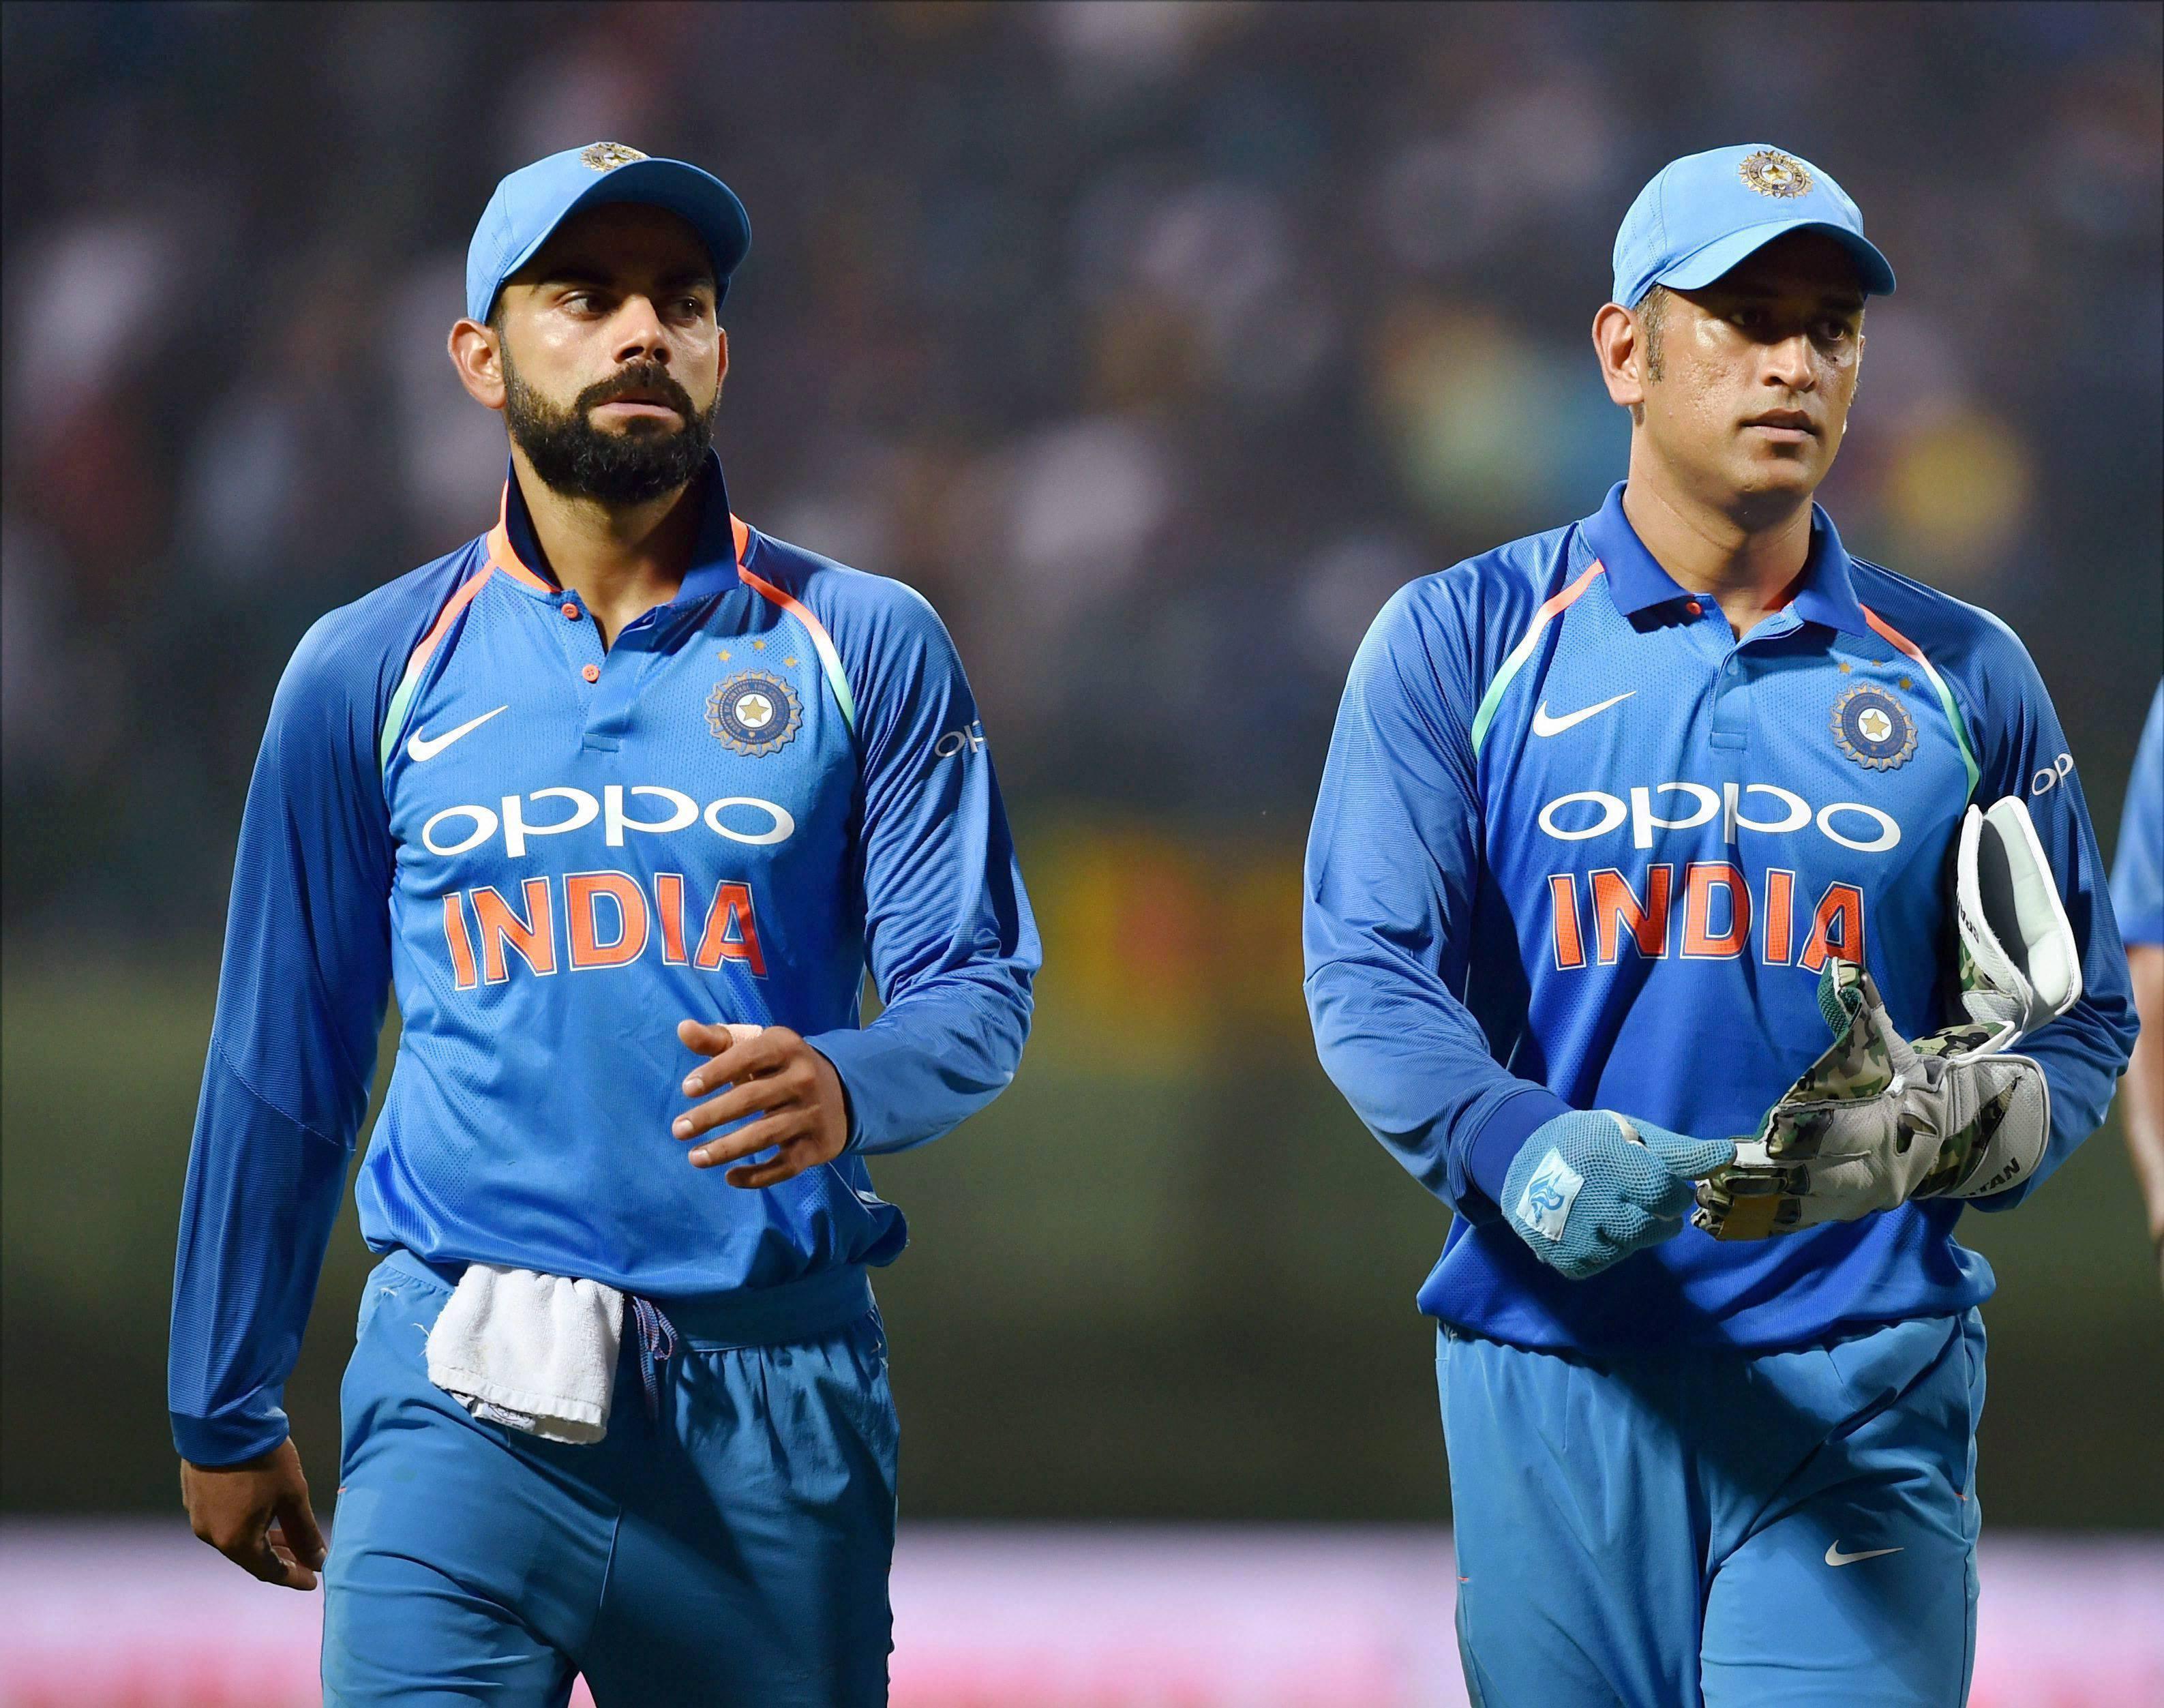 Ms Dhoni Not Virat Kohli Is Ajay Jadeja S Choice India Captain At Icc World Cup